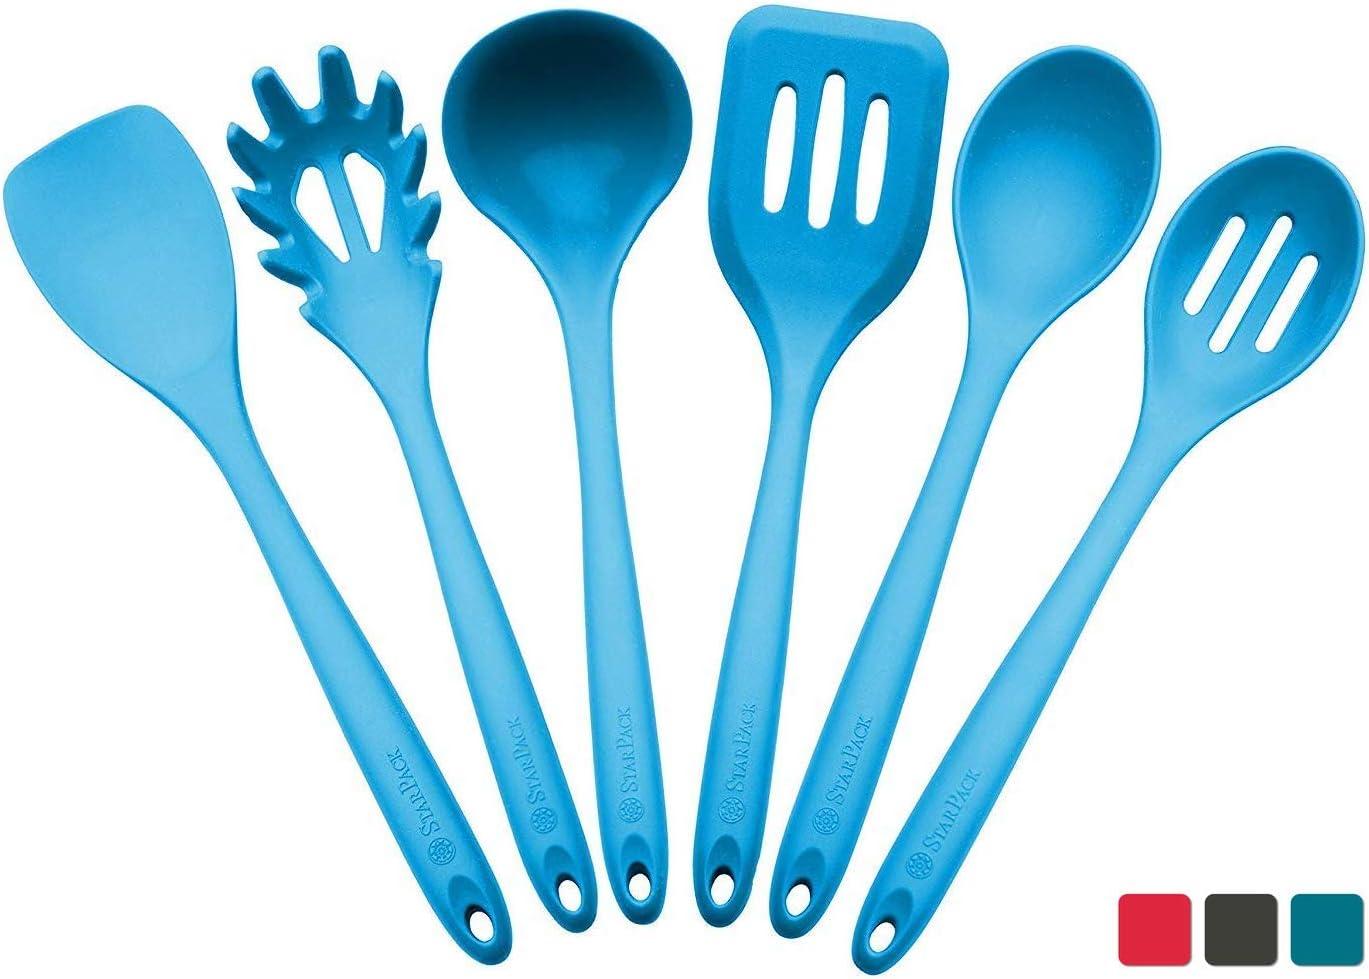 StarPack Premium XL Silicone Kitchen Utensil Set (6 Piece), High Heat Resistant to 600°F, Hygienic One Piece Design, Large Non Stick Spatulas & Serving Utensils - Teal Blue